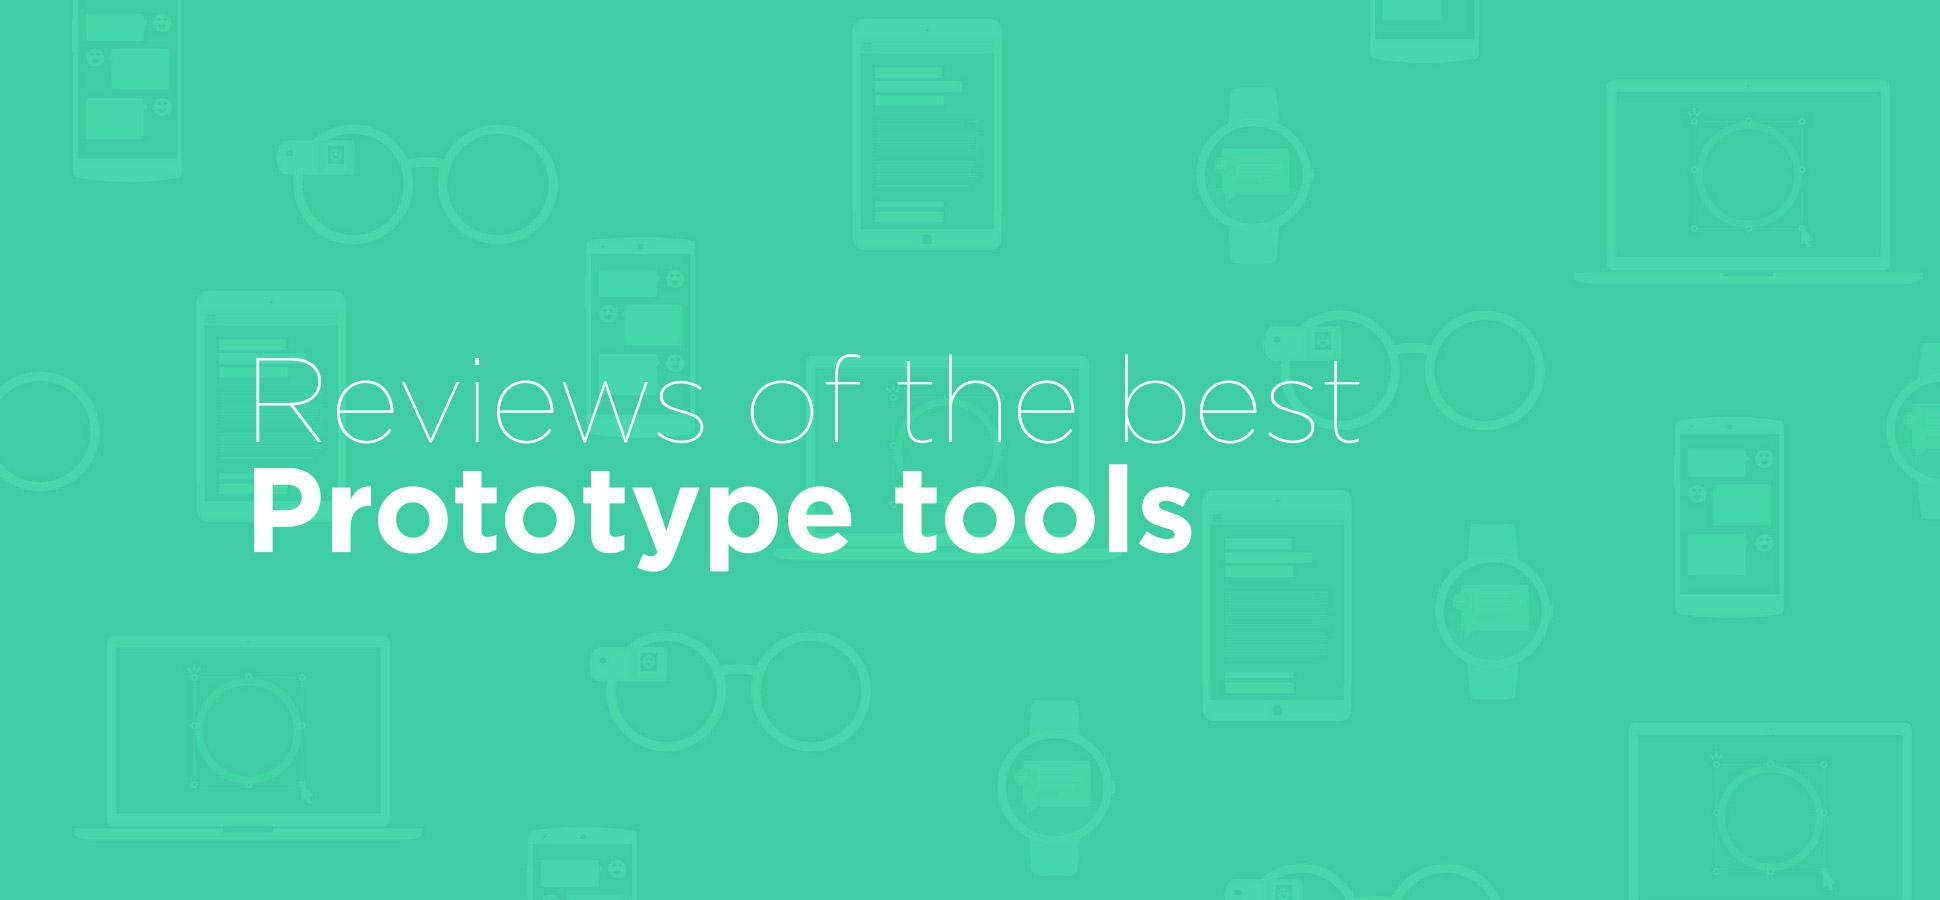 prototype_tools.jpg